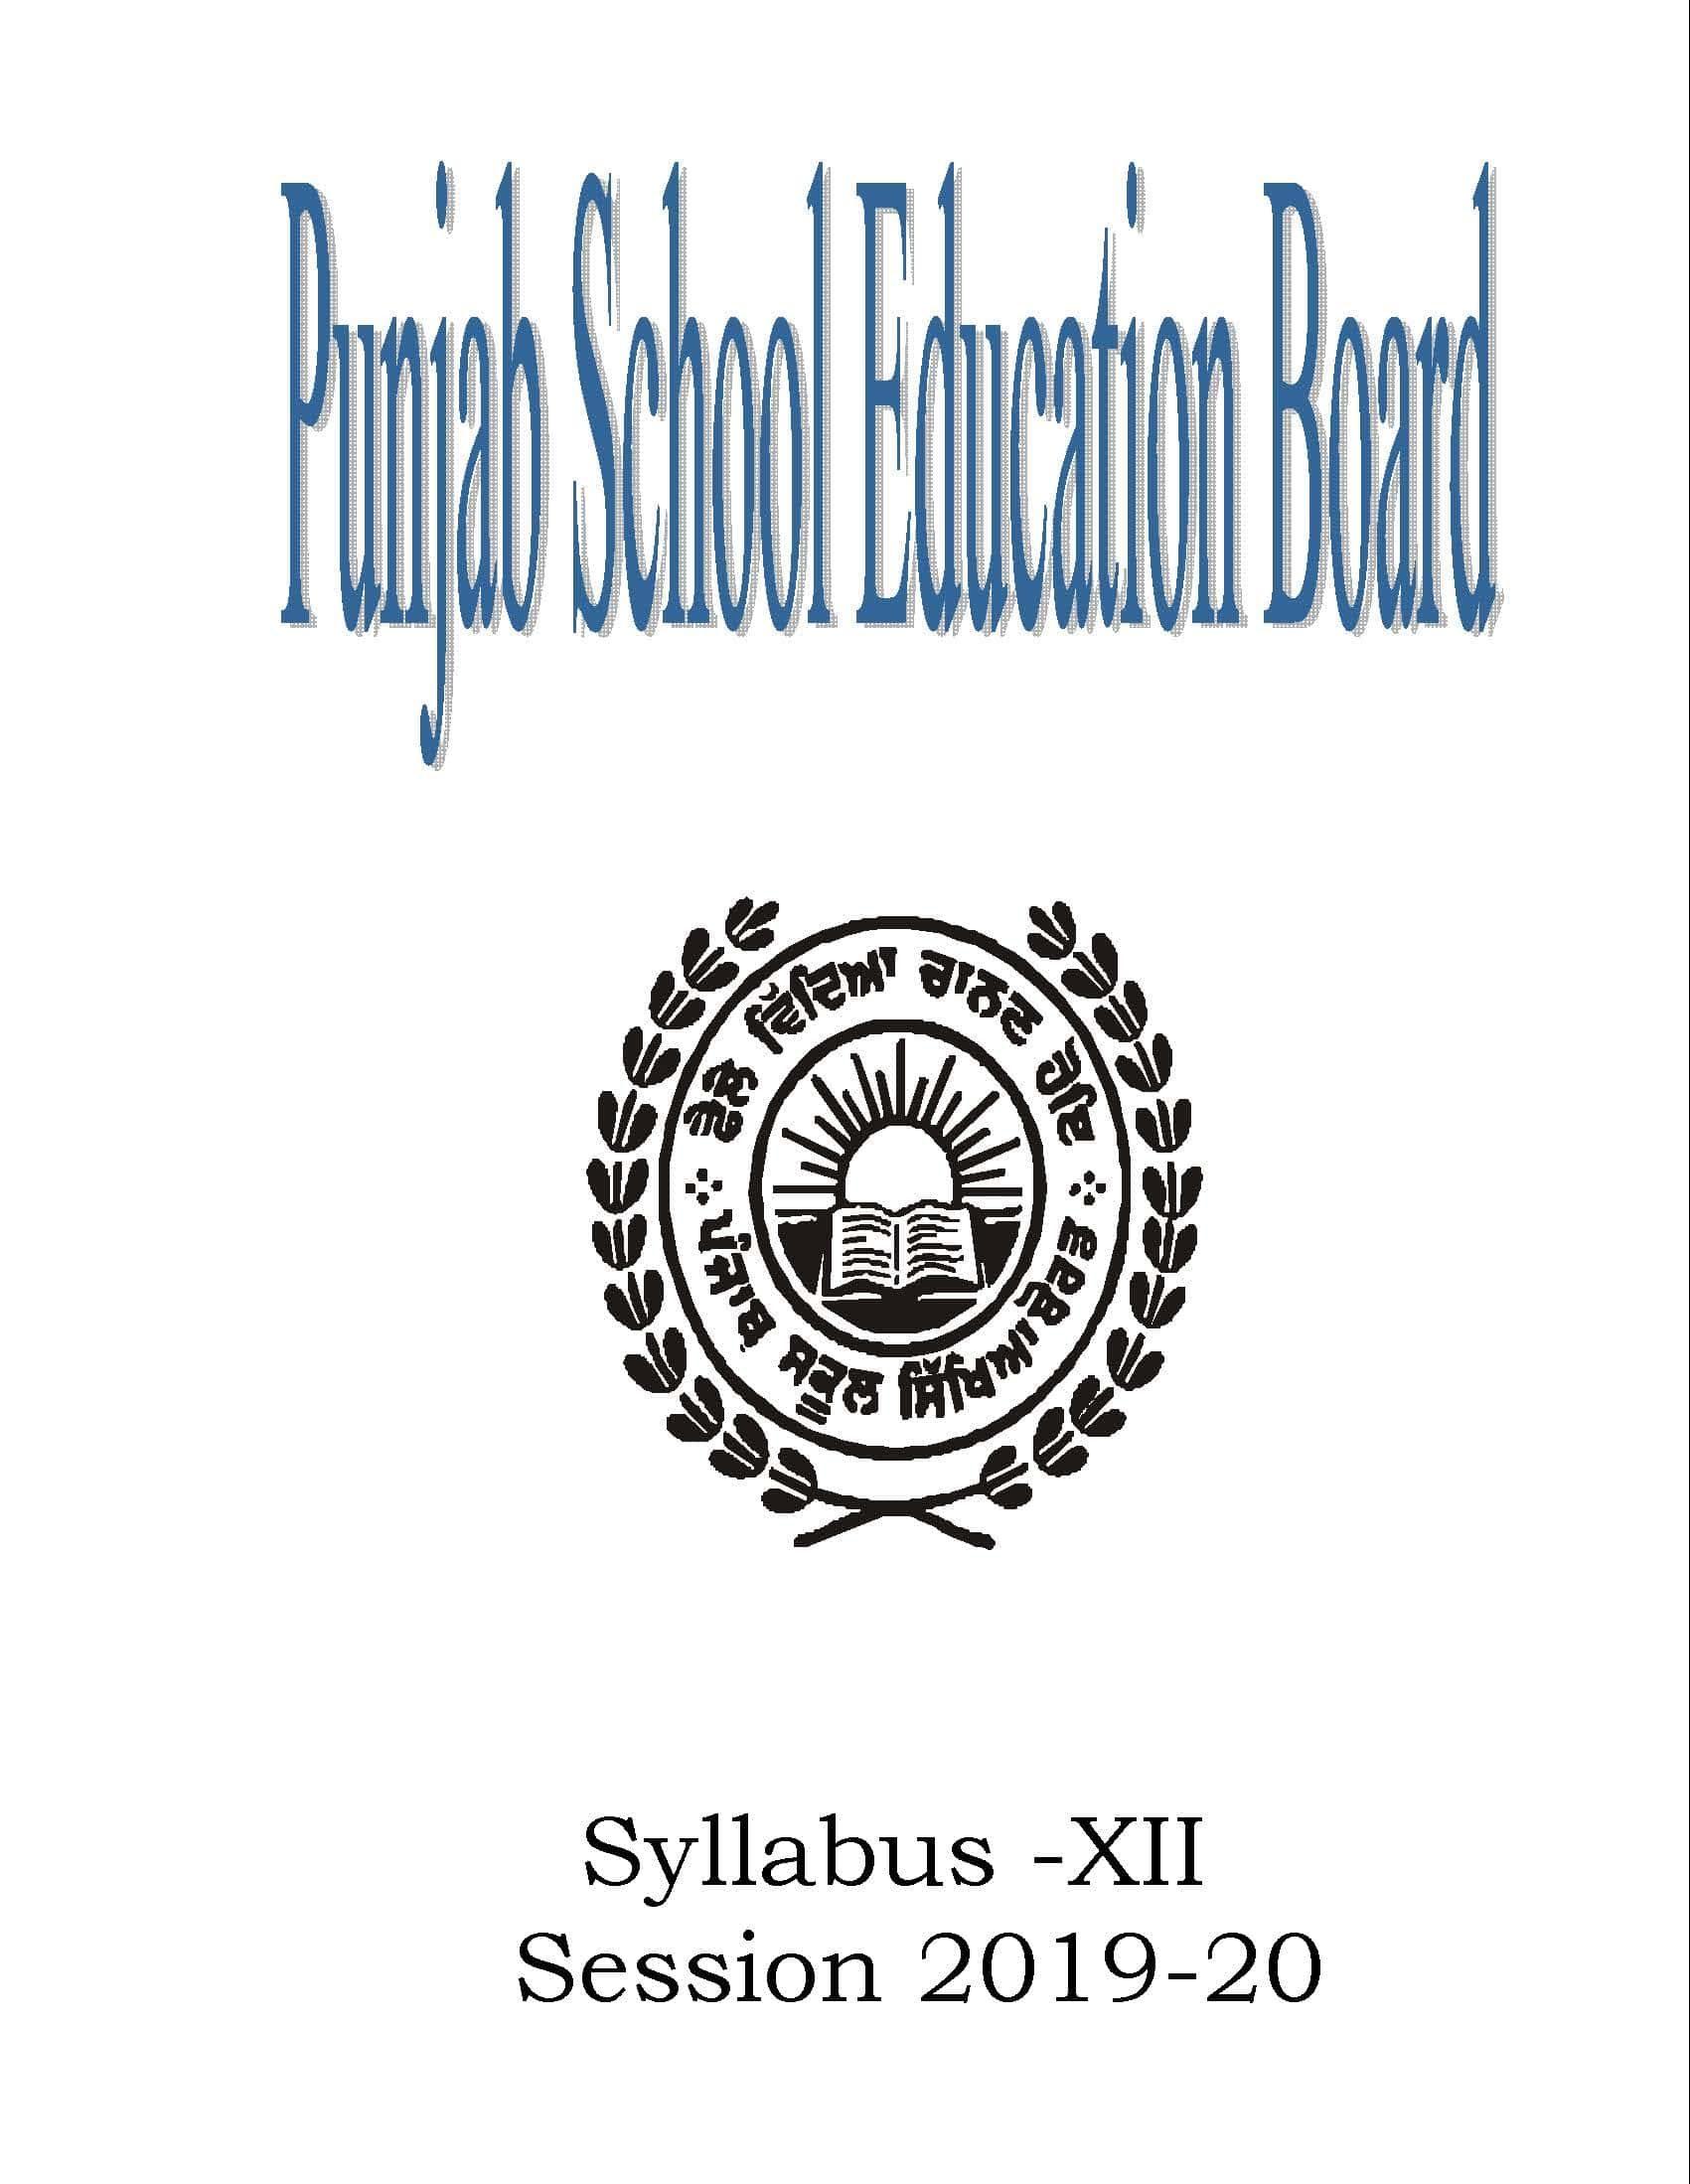 Syllabus from Academic Year 2019-20 of Punjab School Education Board